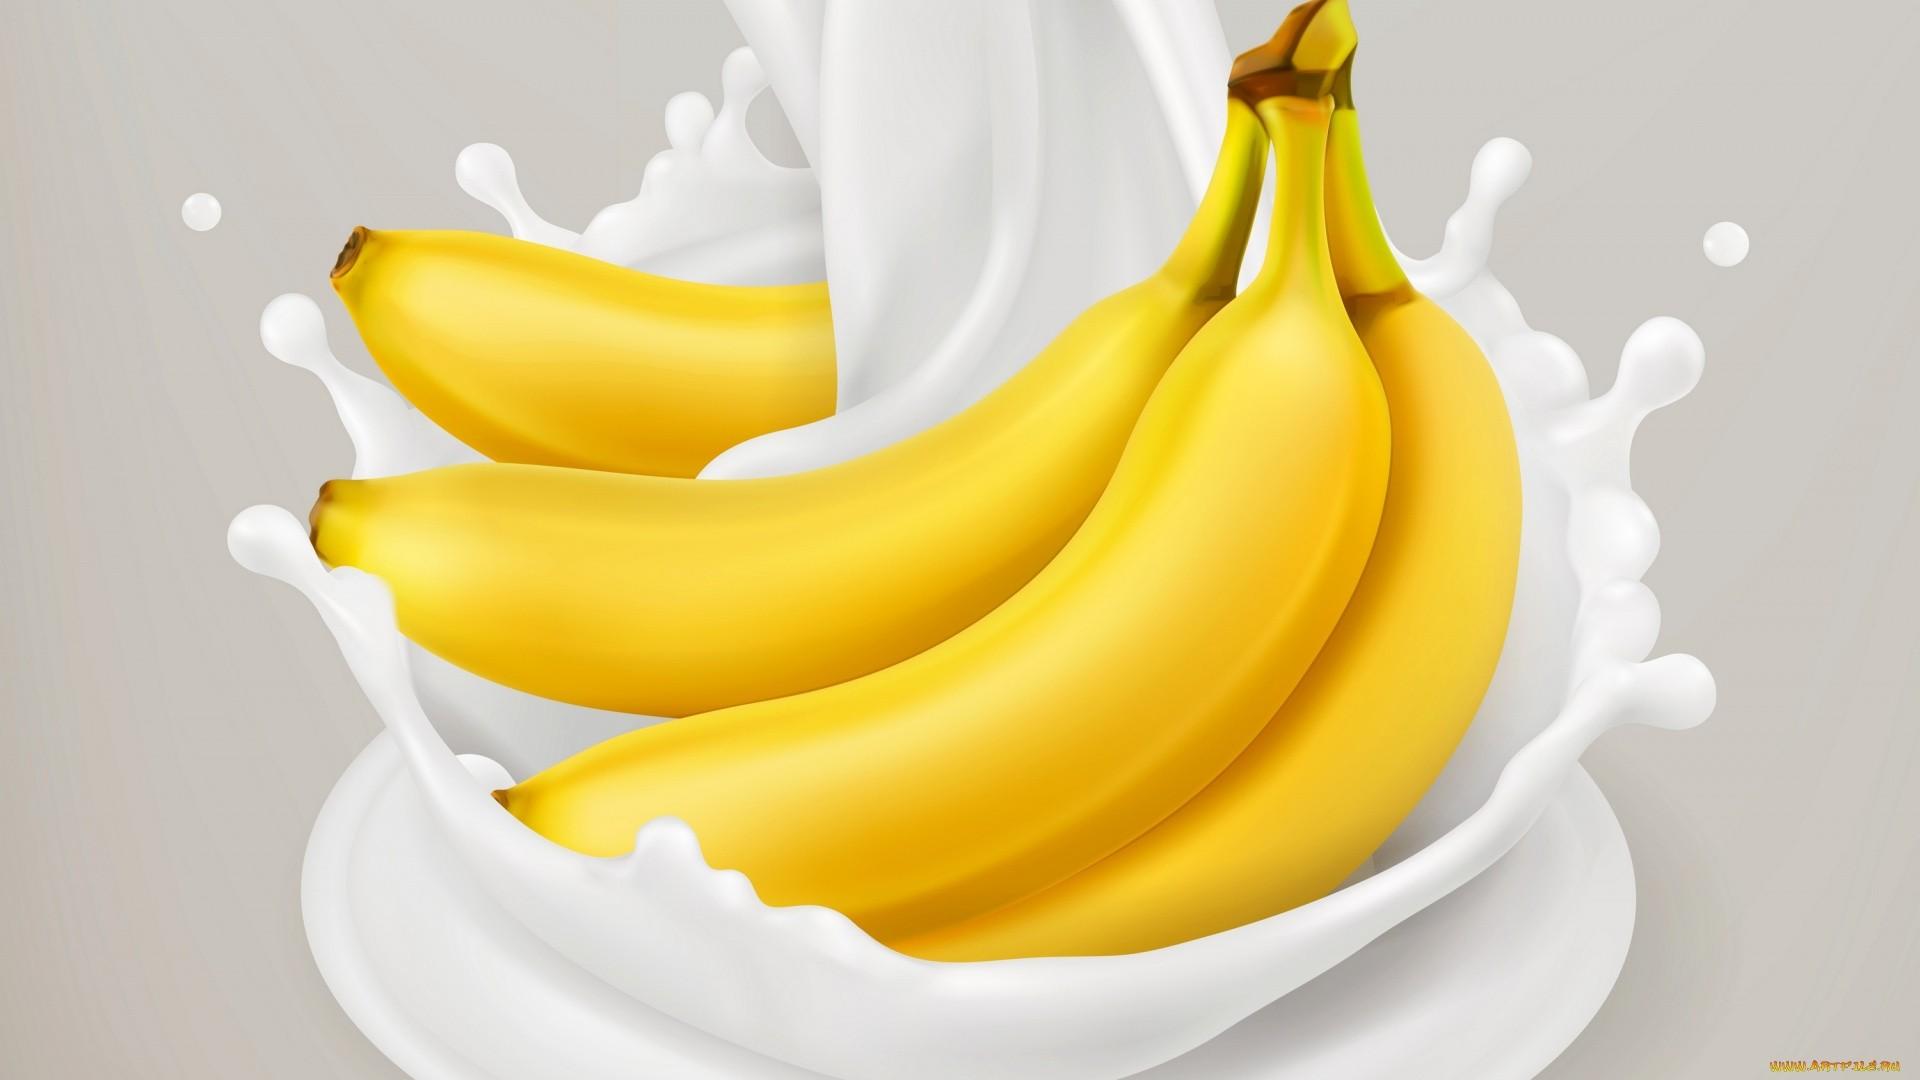 Banana Background Wallpaper